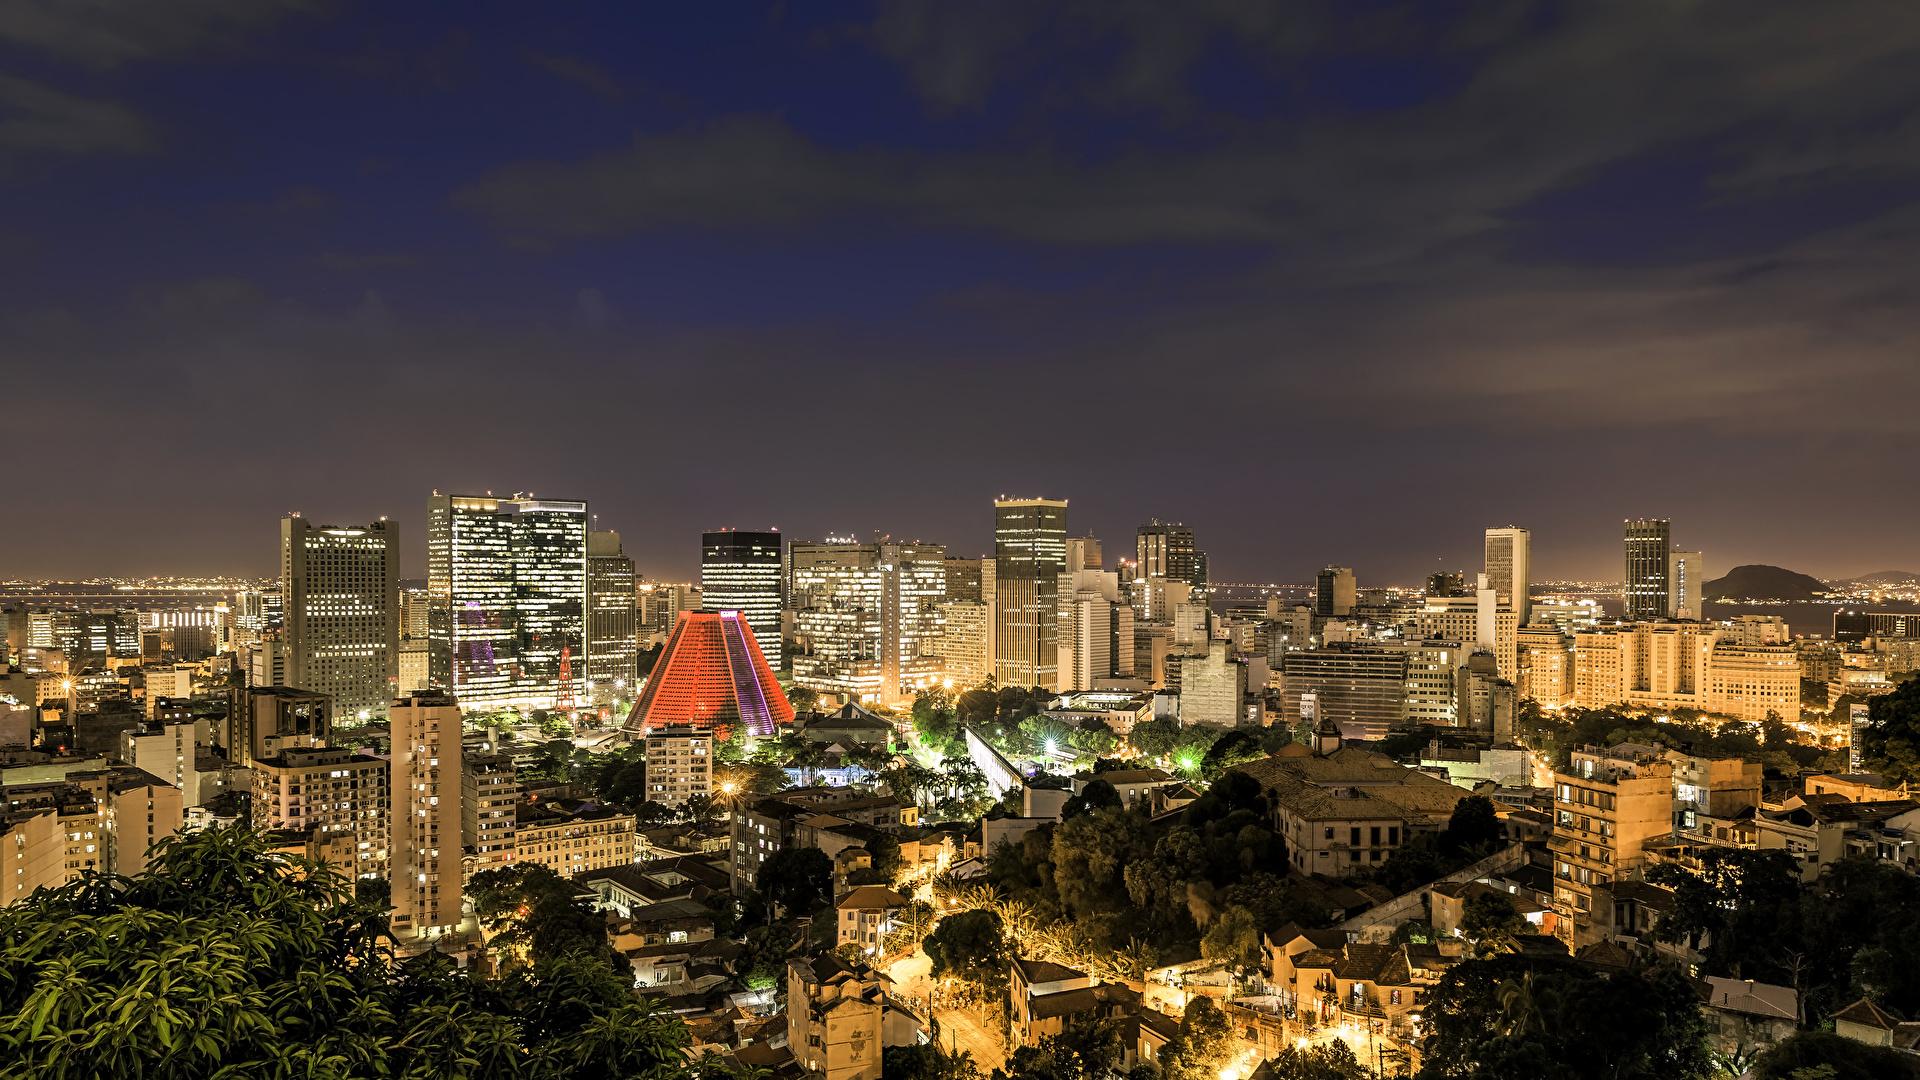 Images Rio De Janeiro Brazil Megapolis Night Cities Houses 1920x1080